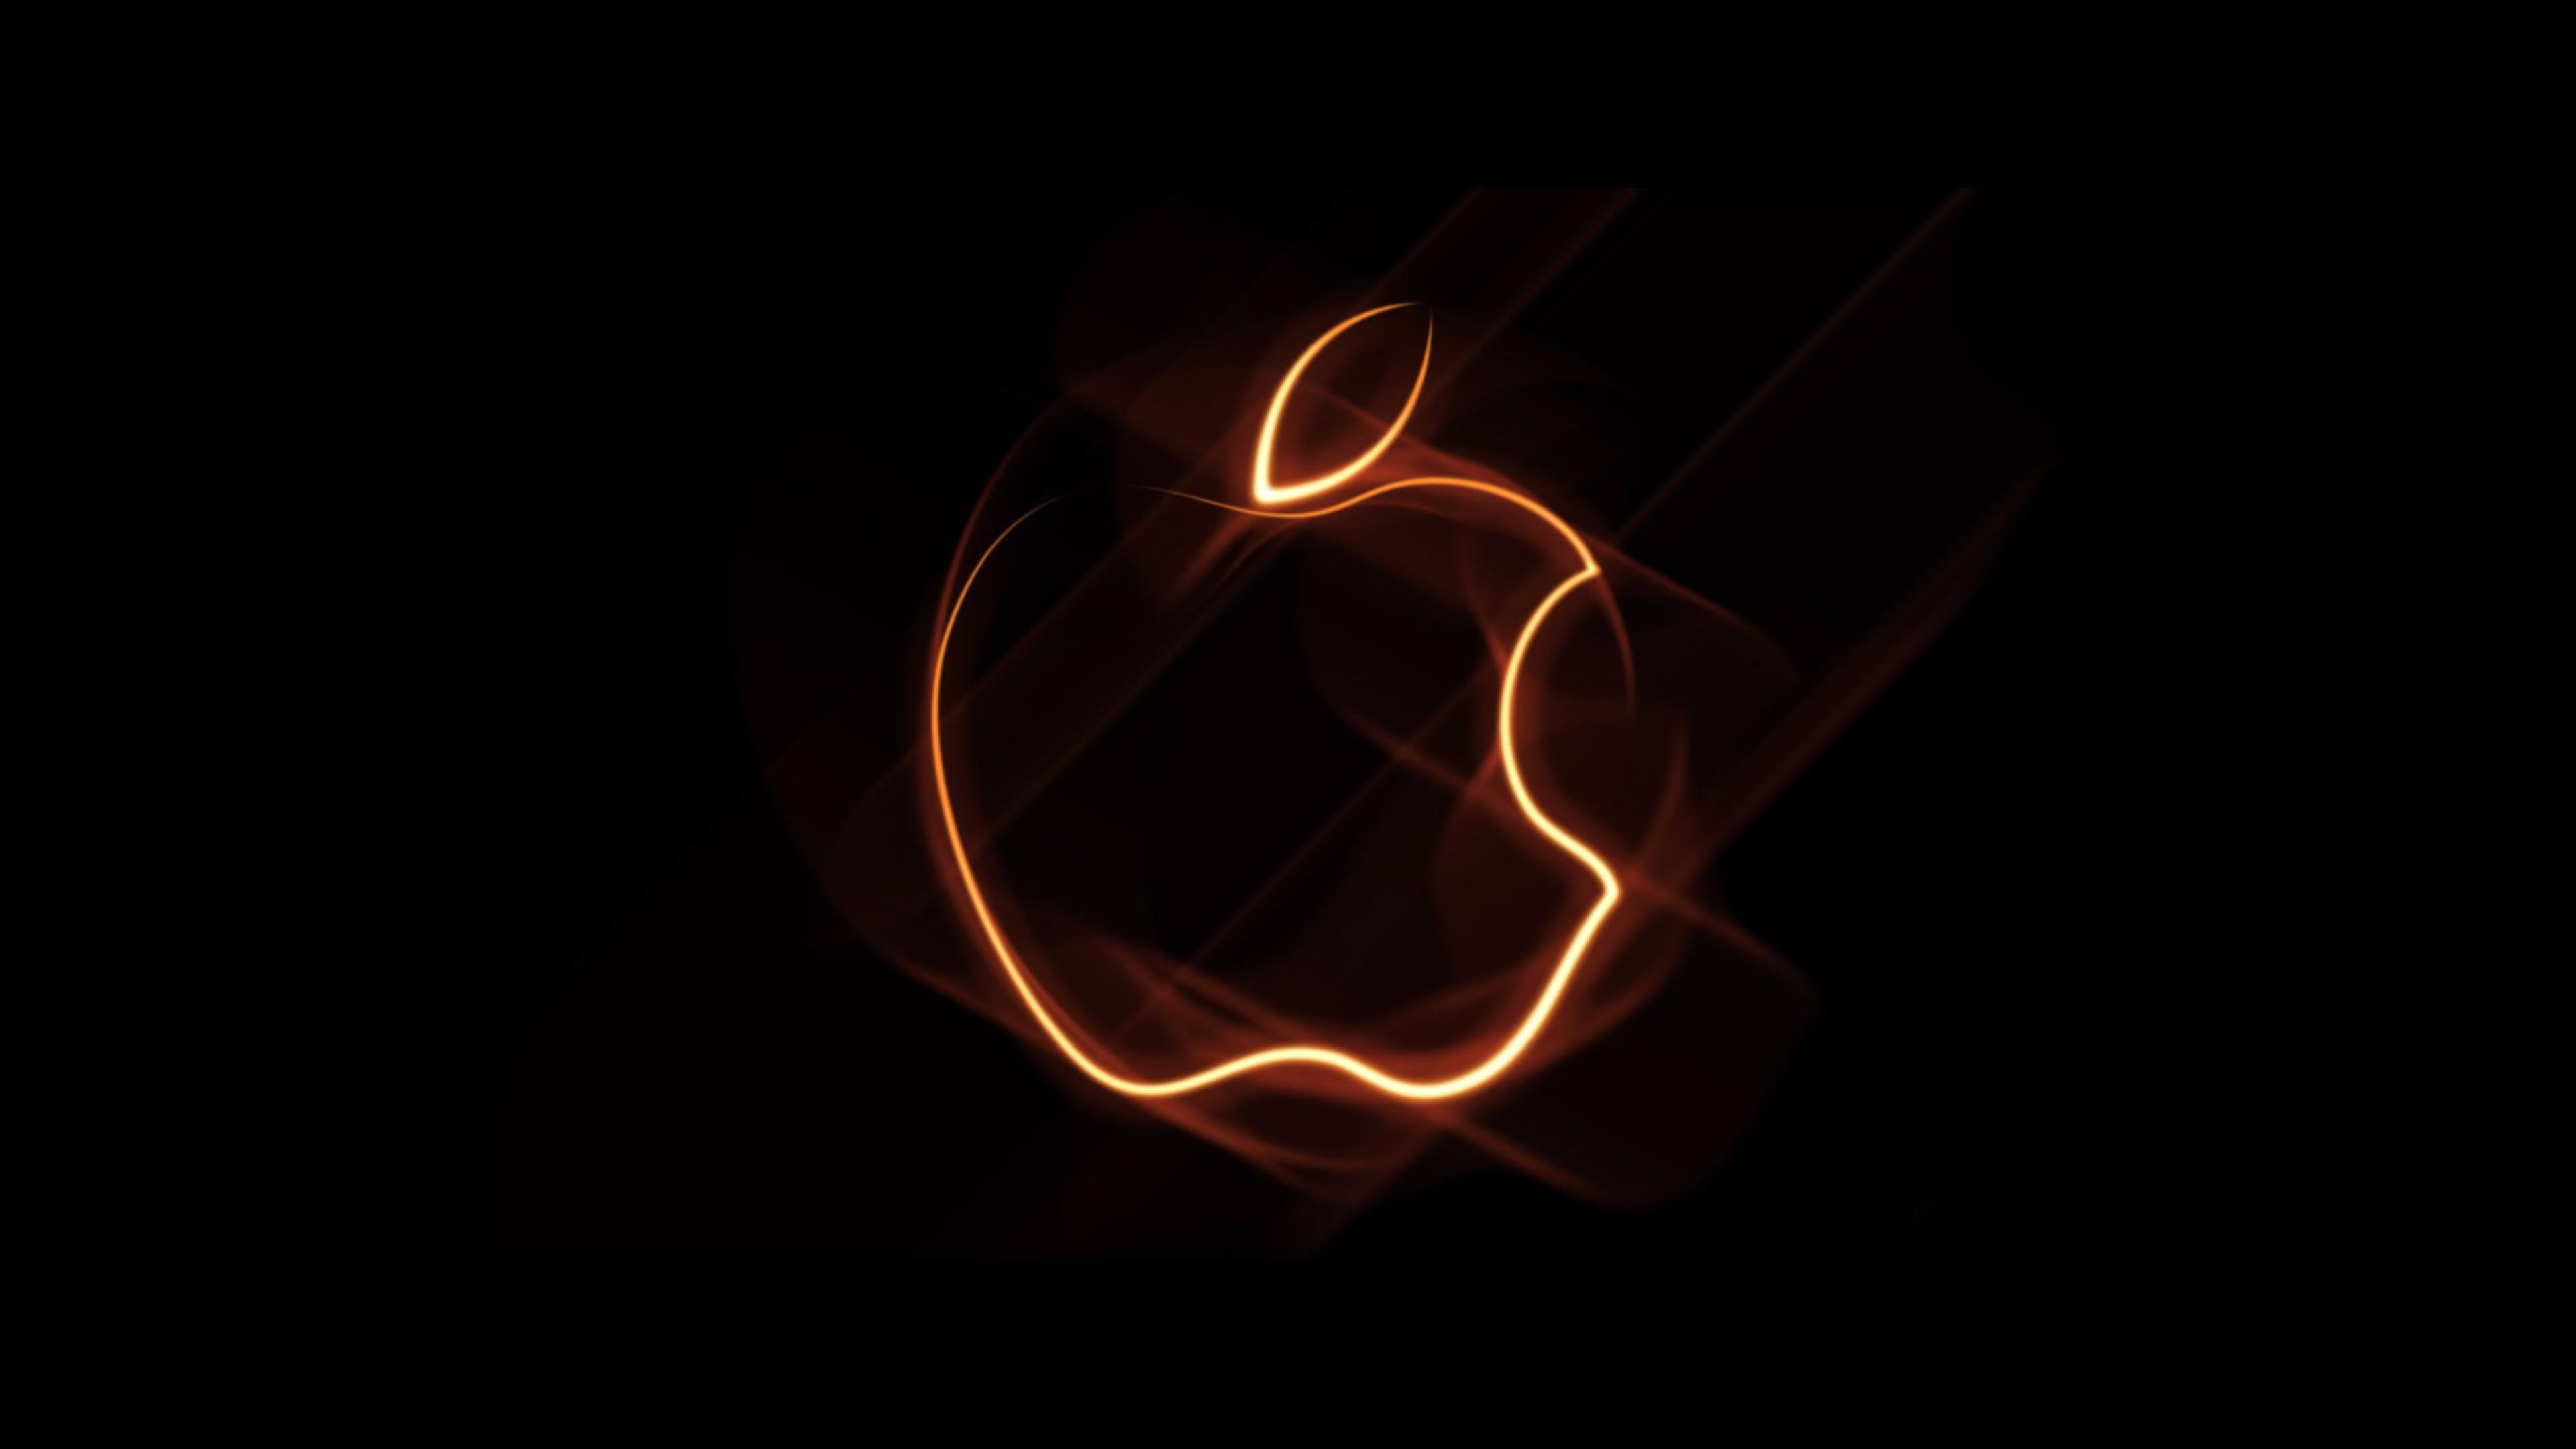 Apple Logo Wallpaper Hd 1080p Posted By Ethan Walker